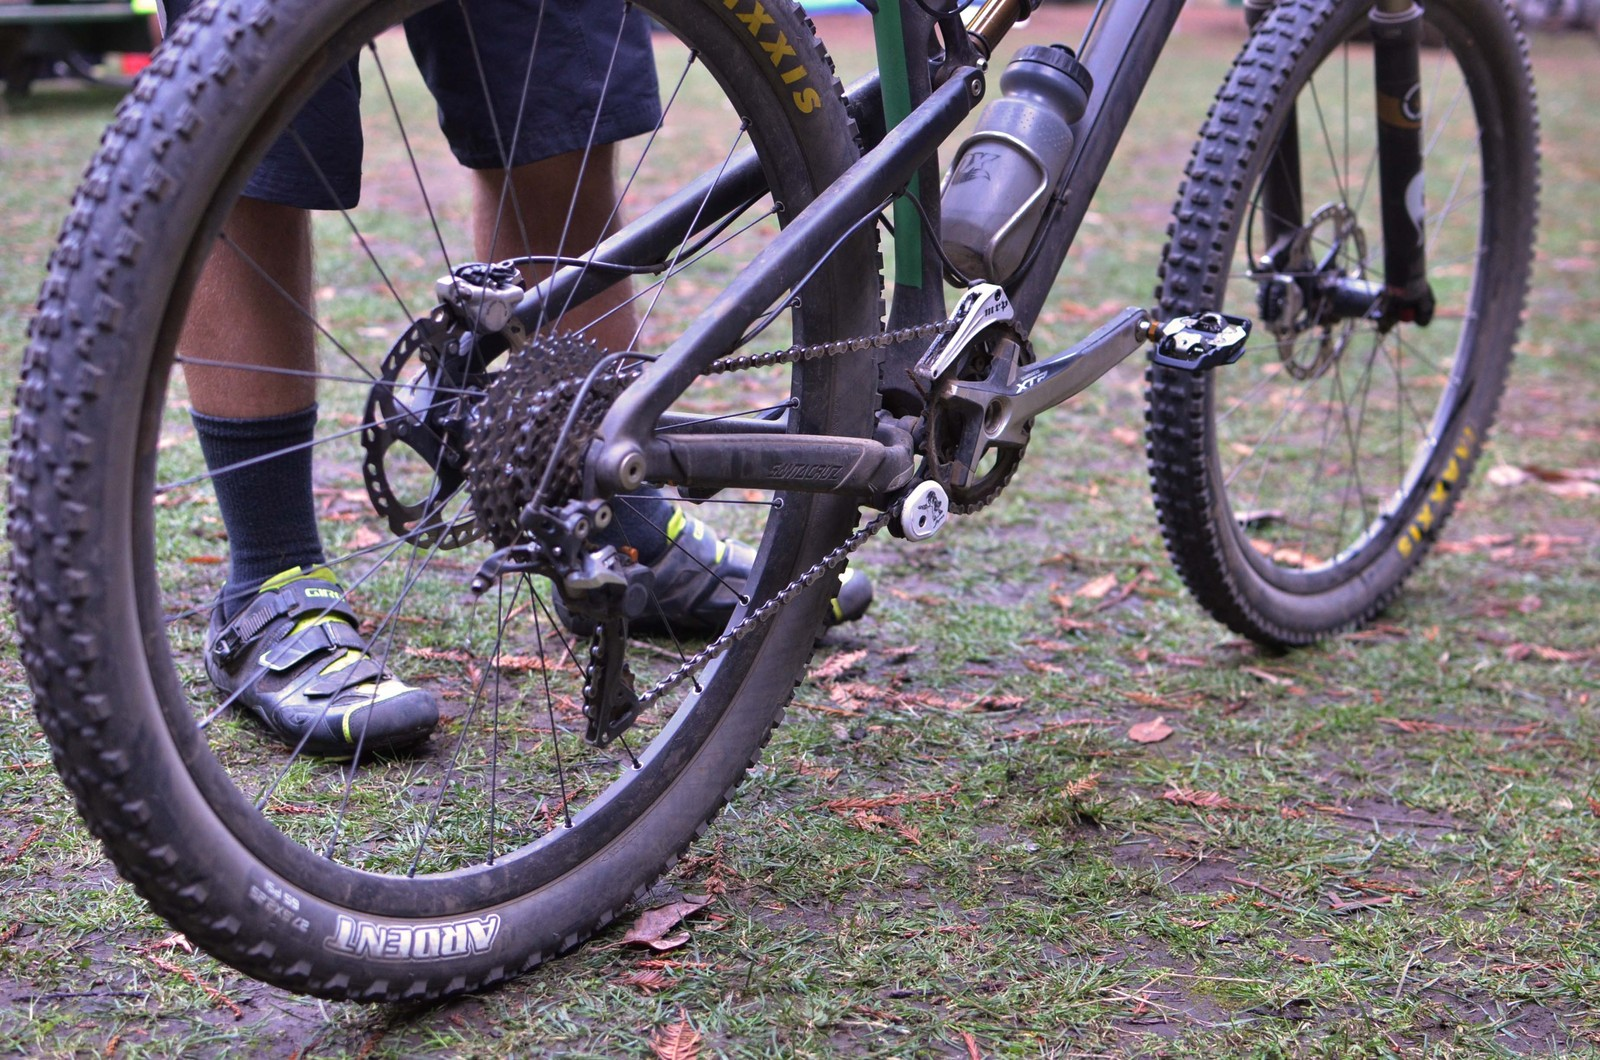 Ariel Lindsley's Santa Cruz 5010 - PIT BITS - 2013 Santa Cruz Super Enduro - Mountain Biking Pictures - Vital MTB